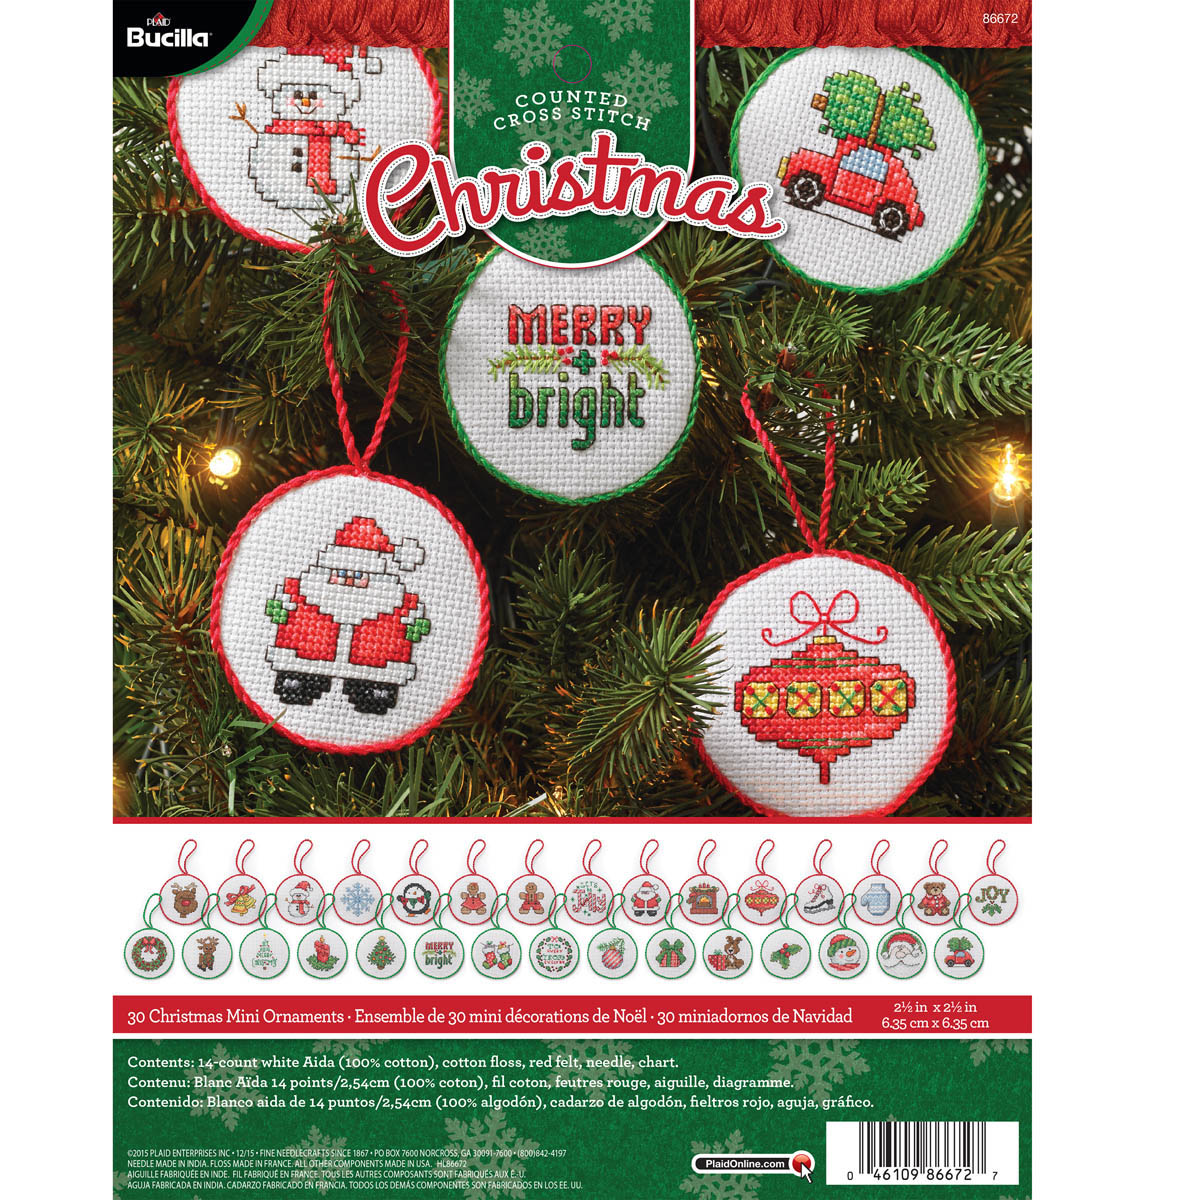 Bucilla ® Seasonal - Counted Cross Stitch - Ornament Kits - Christmas Minis - 86672